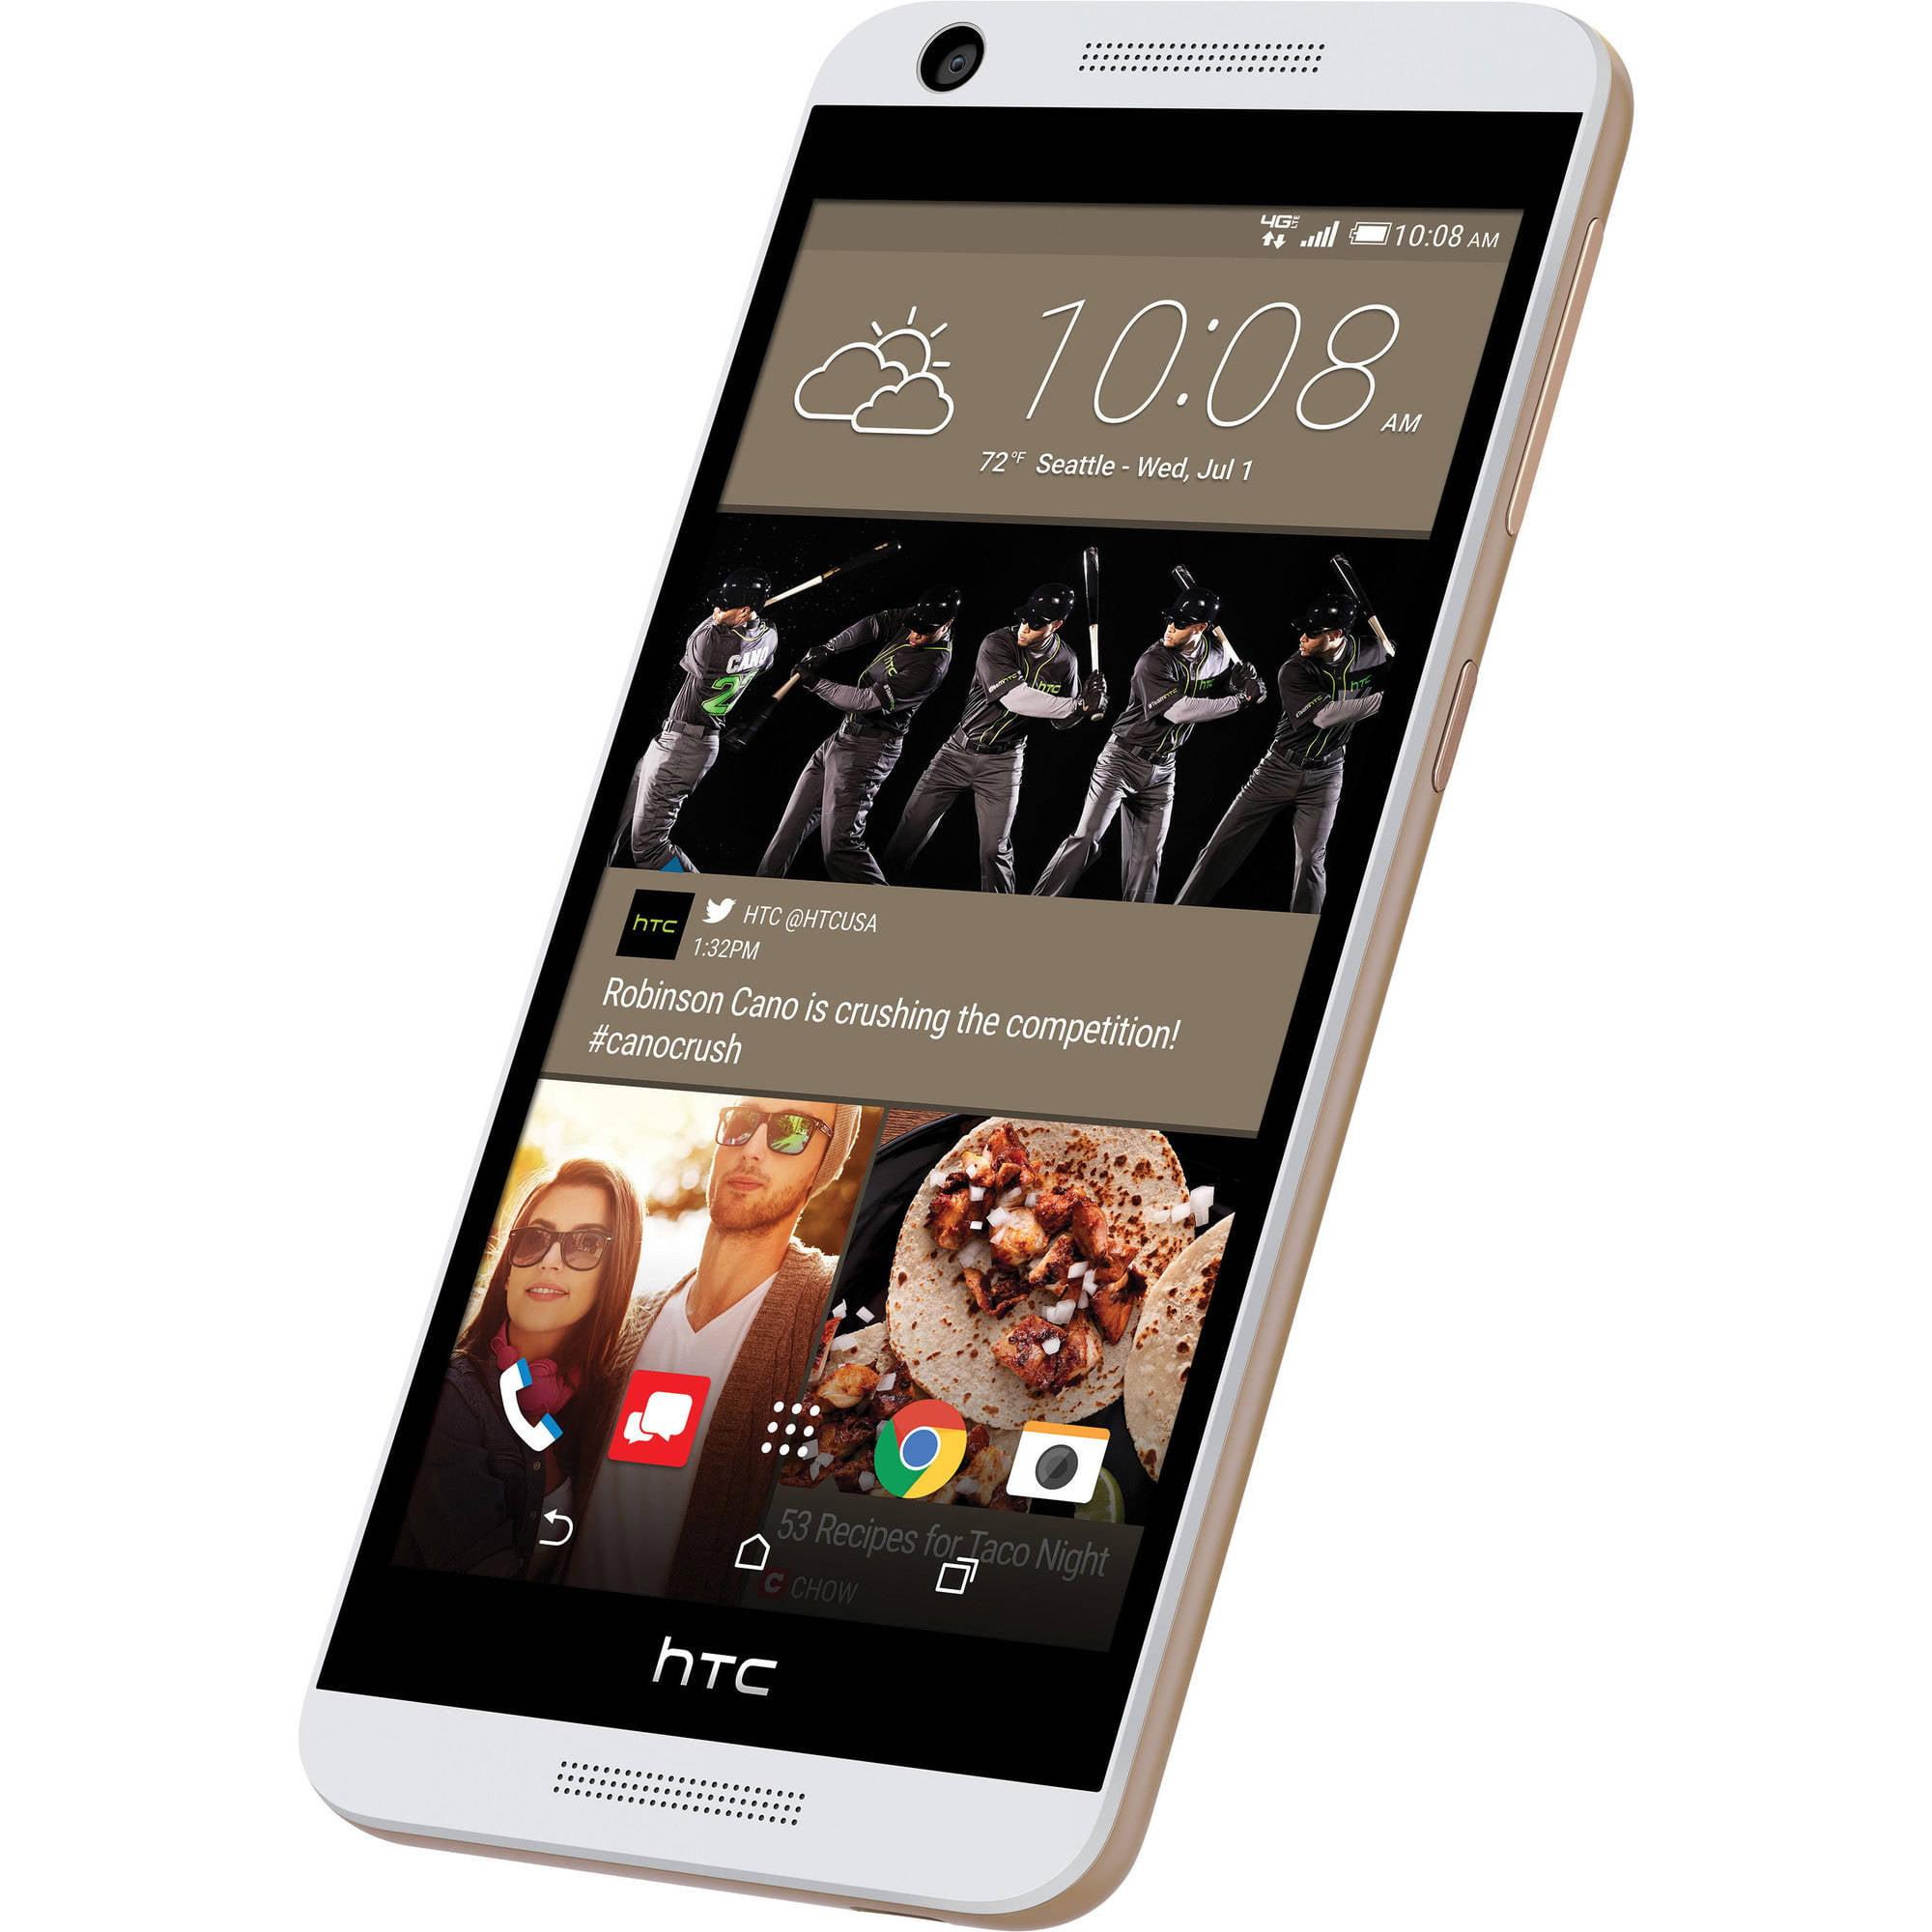 verizon htc desire 626 prepaid smartphone walmart com rh walmart com Verizon Wireless 4G LTE Verizon Motorola